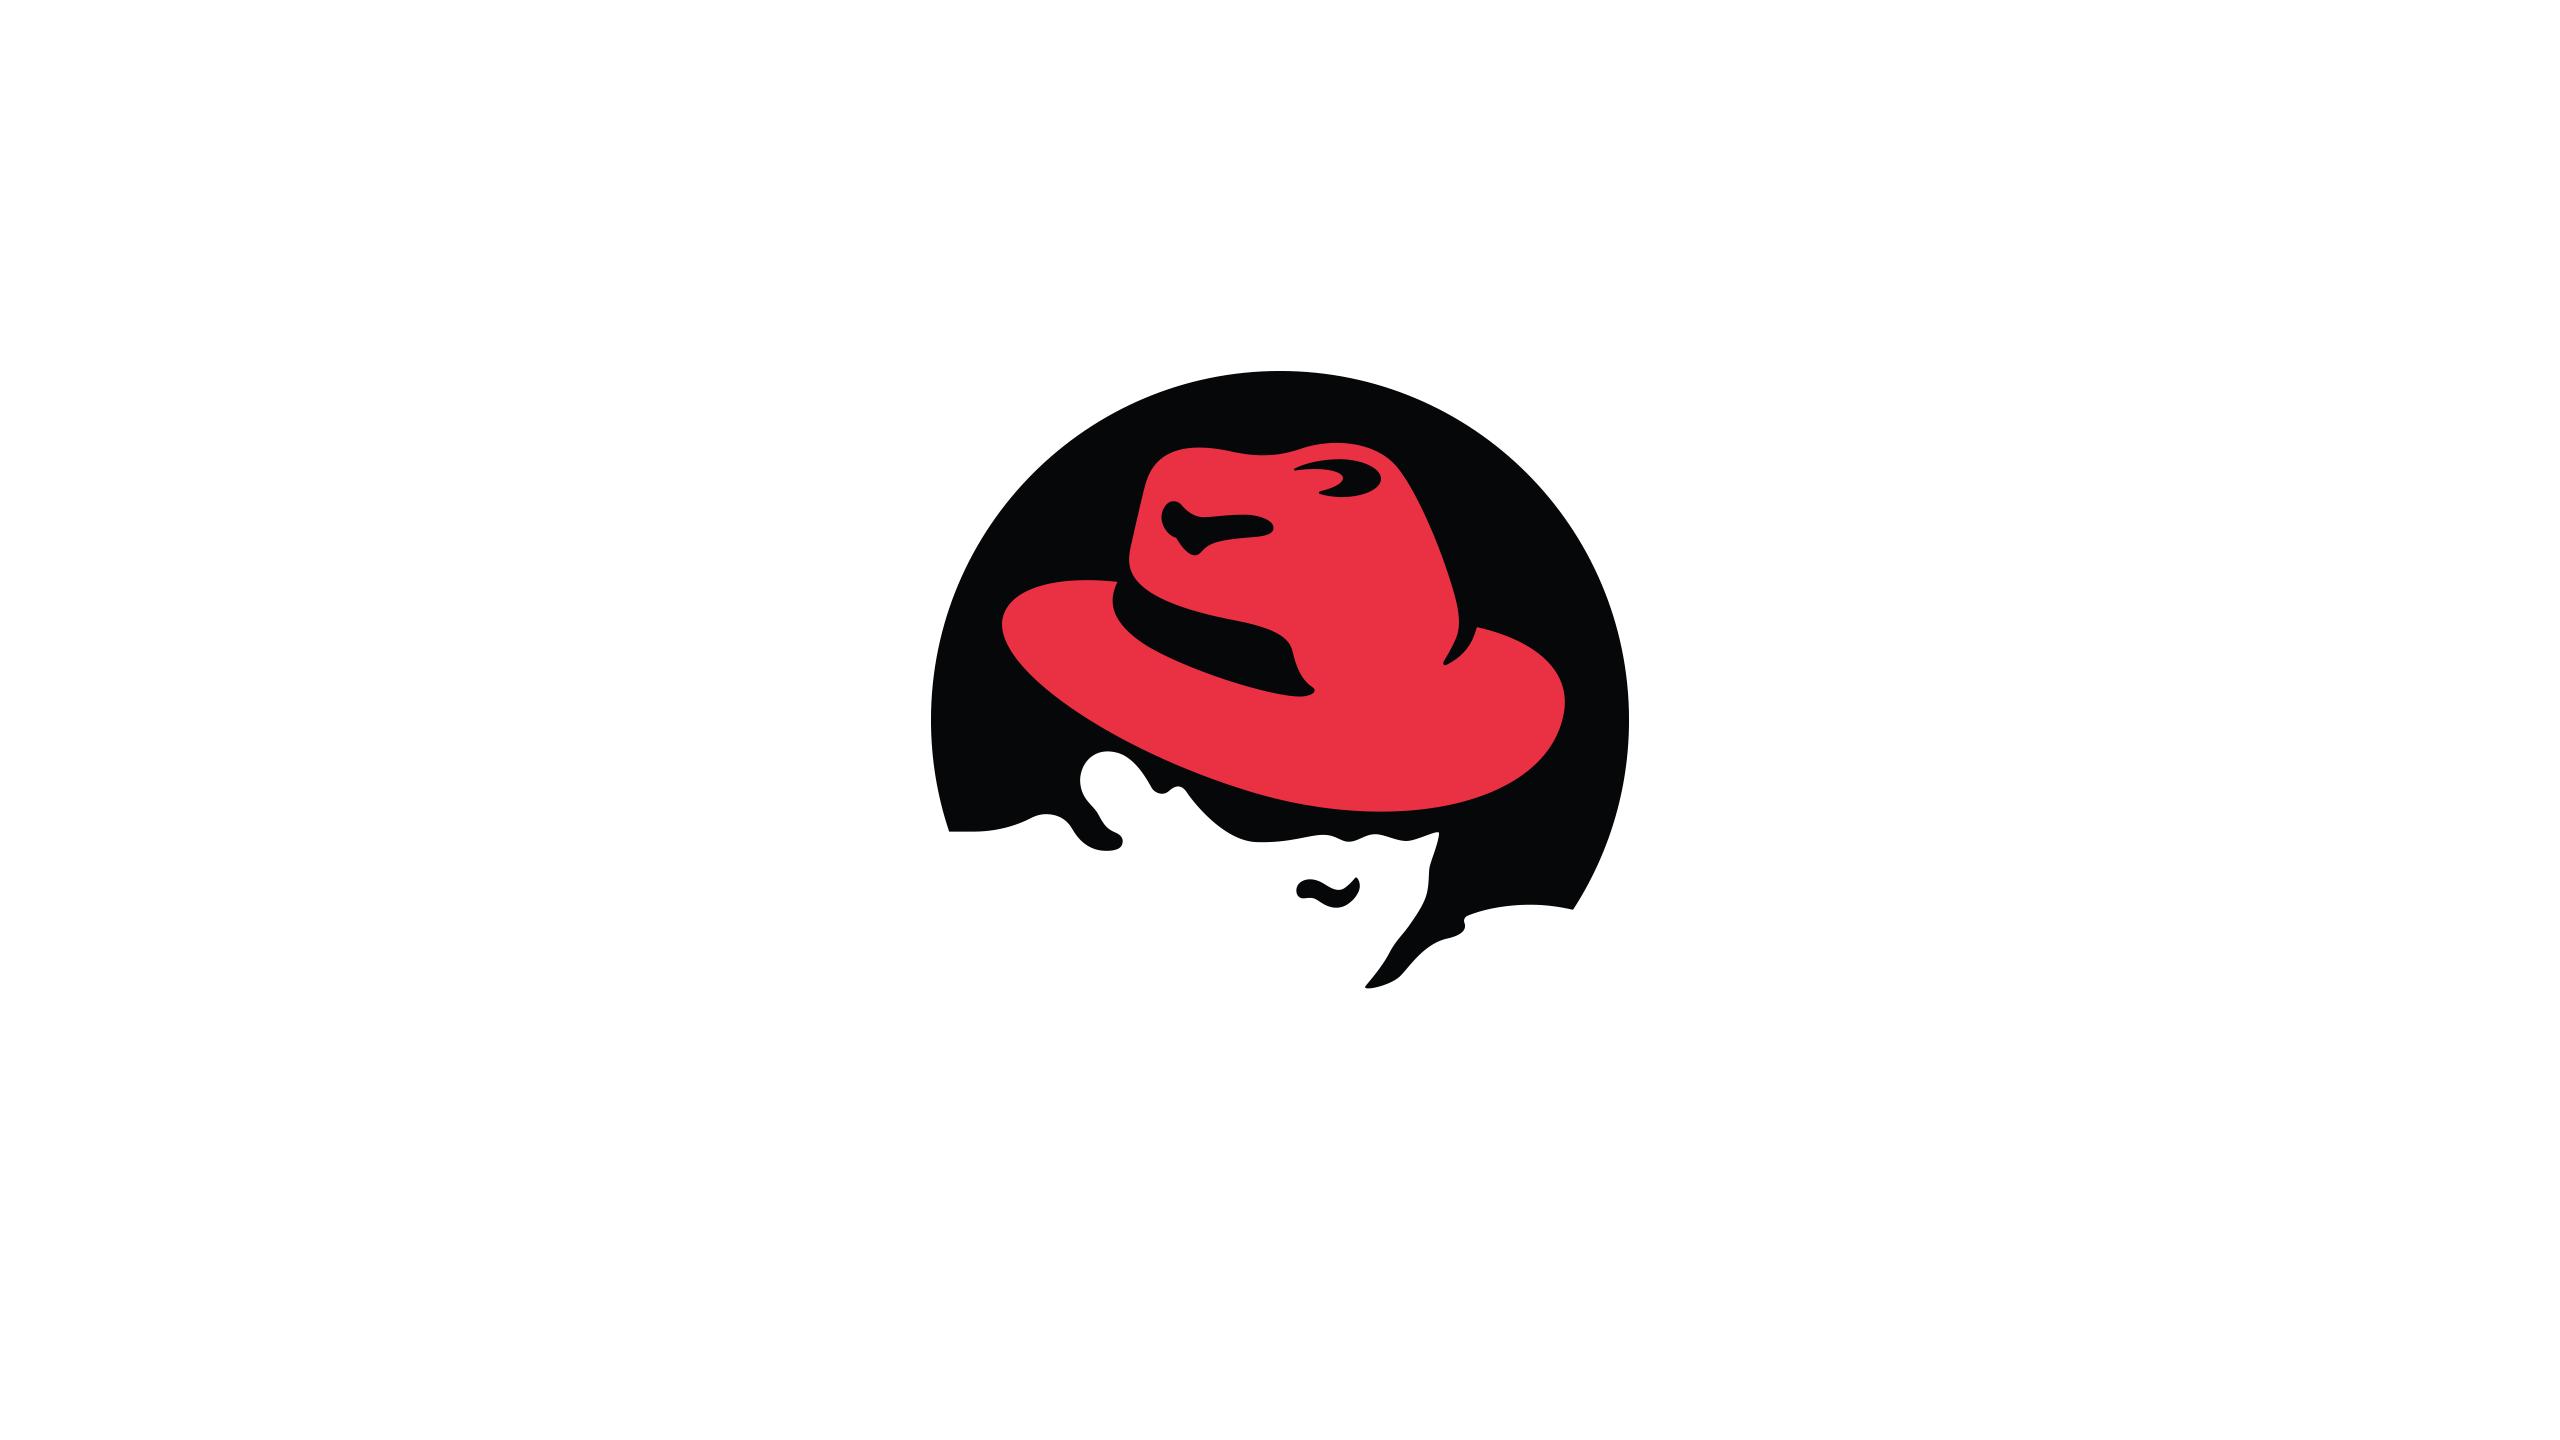 wallpaper red hat logo cartoon moustache red hat